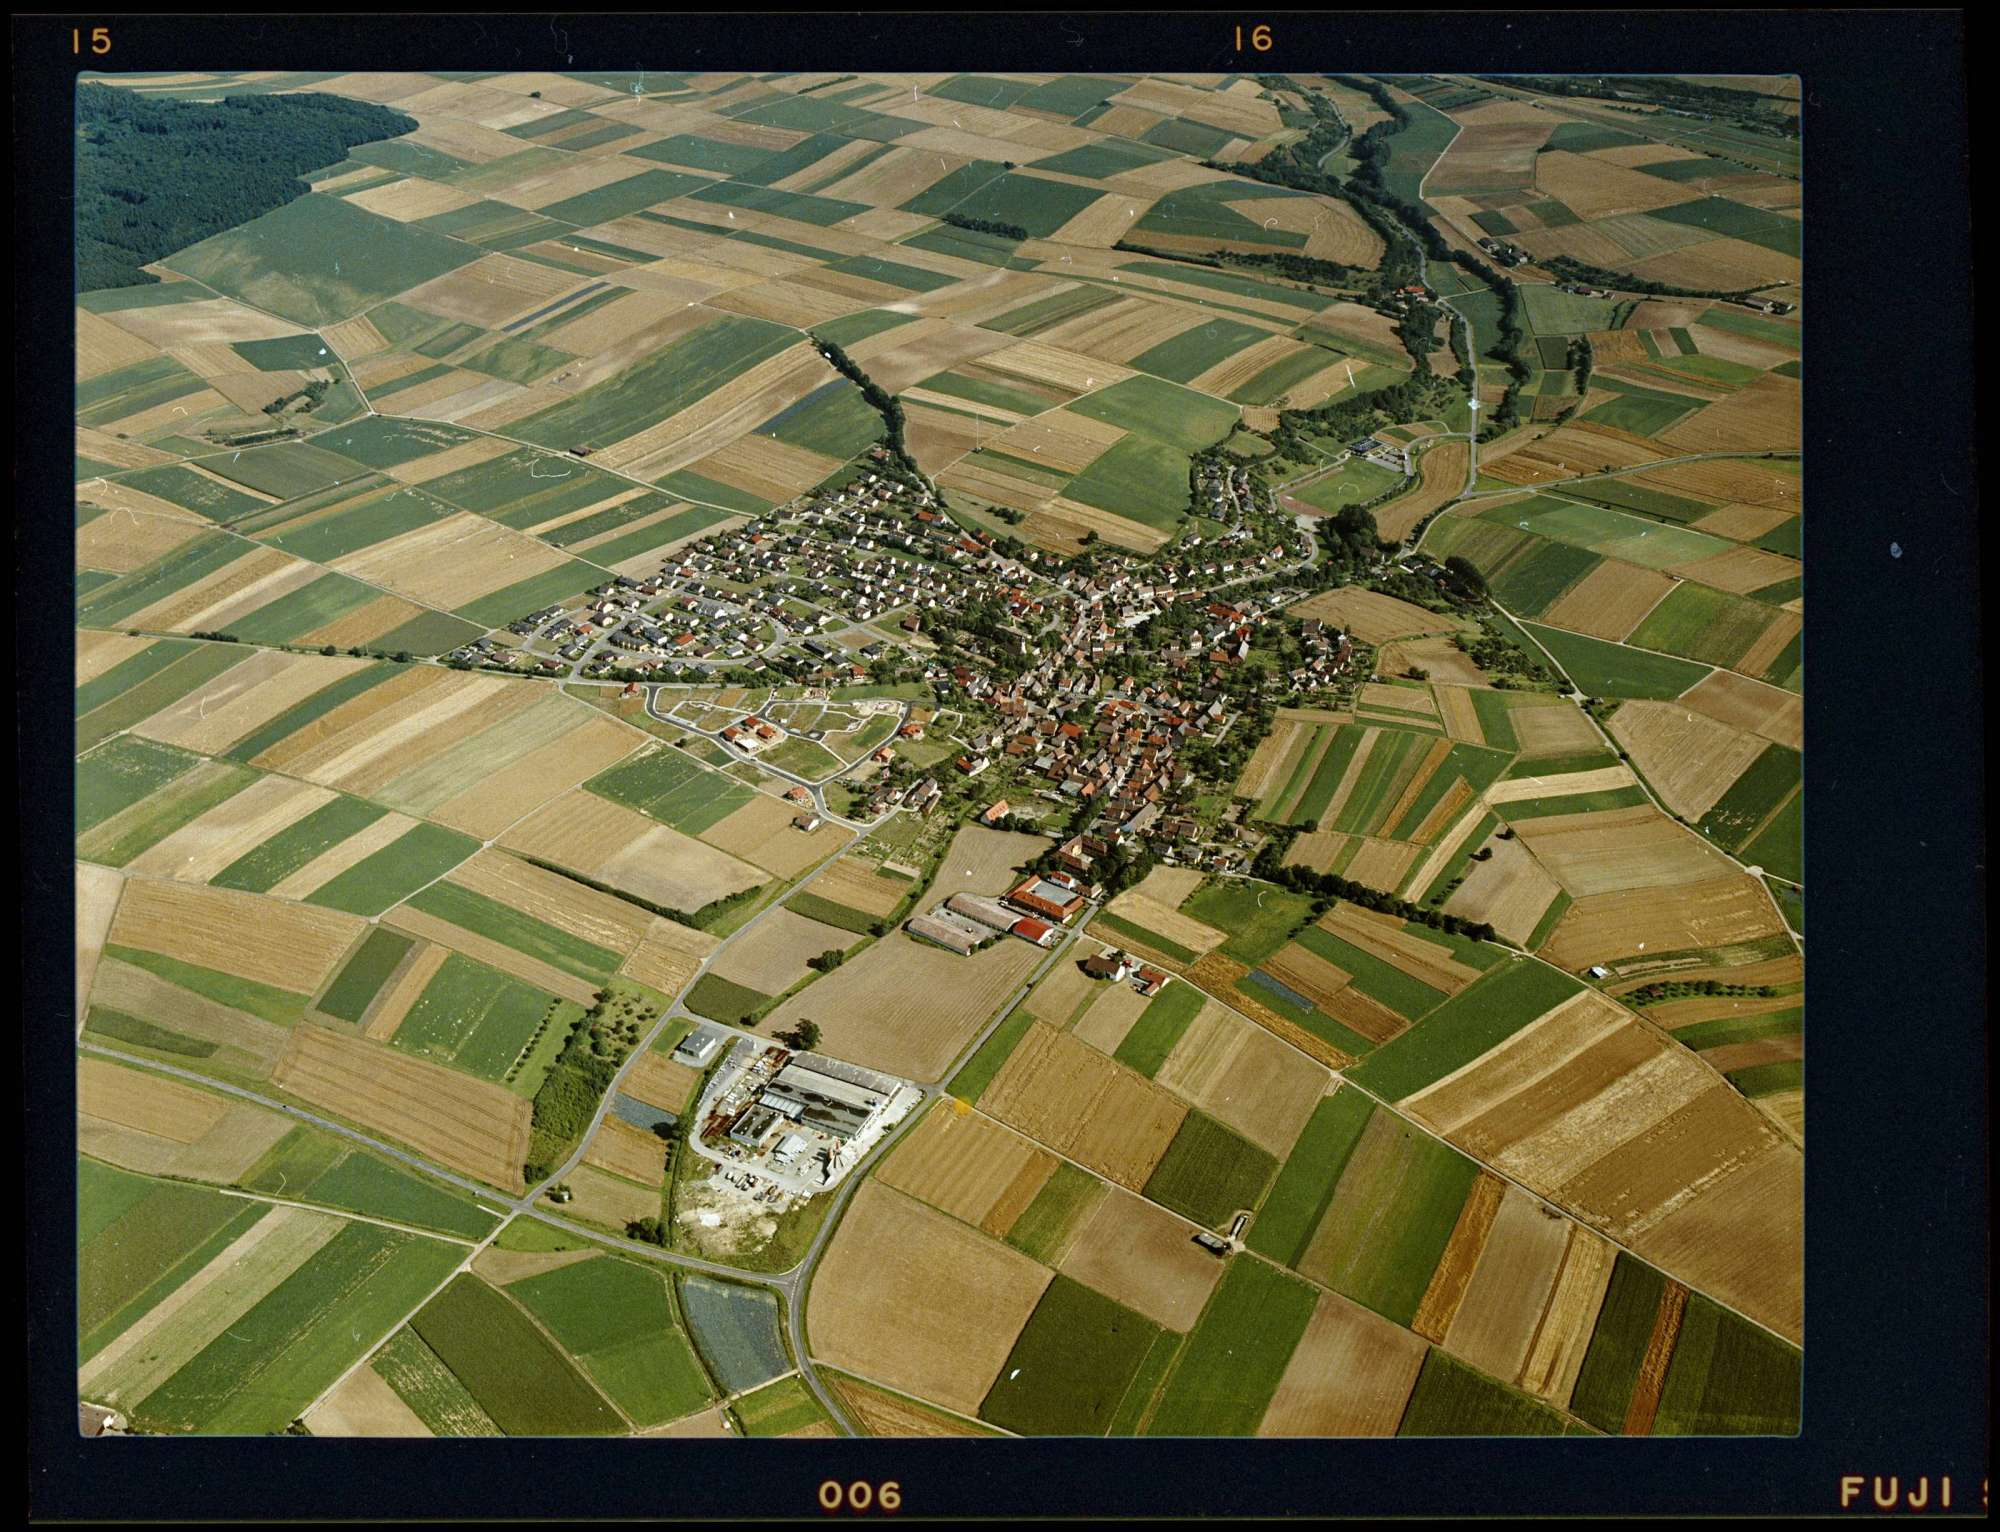 Massenbach, Luftbild, Bild 1